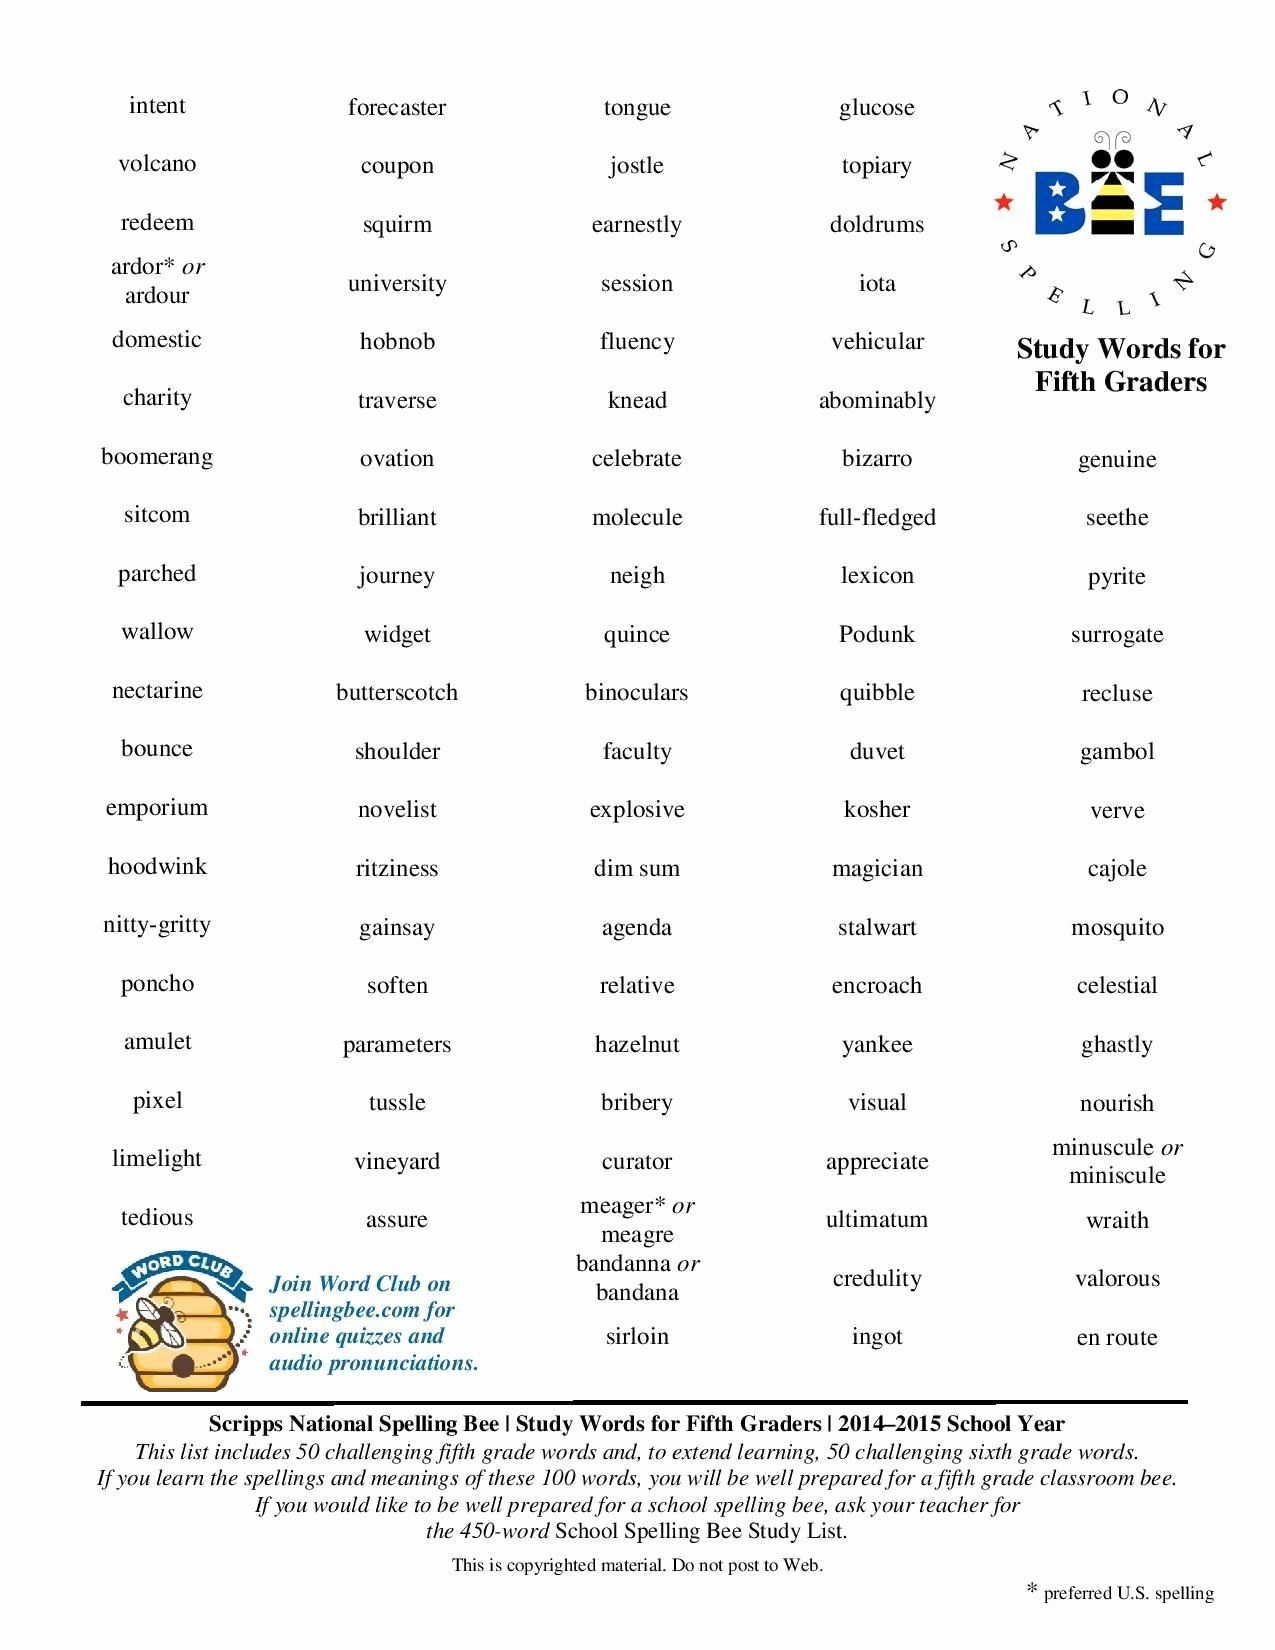 6th Grade Spelling Worksheet New 6th Grade Spelling Worksheet 1st Grade  Spelling Worksheet   Spelling bee words [ 1650 x 1275 Pixel ]